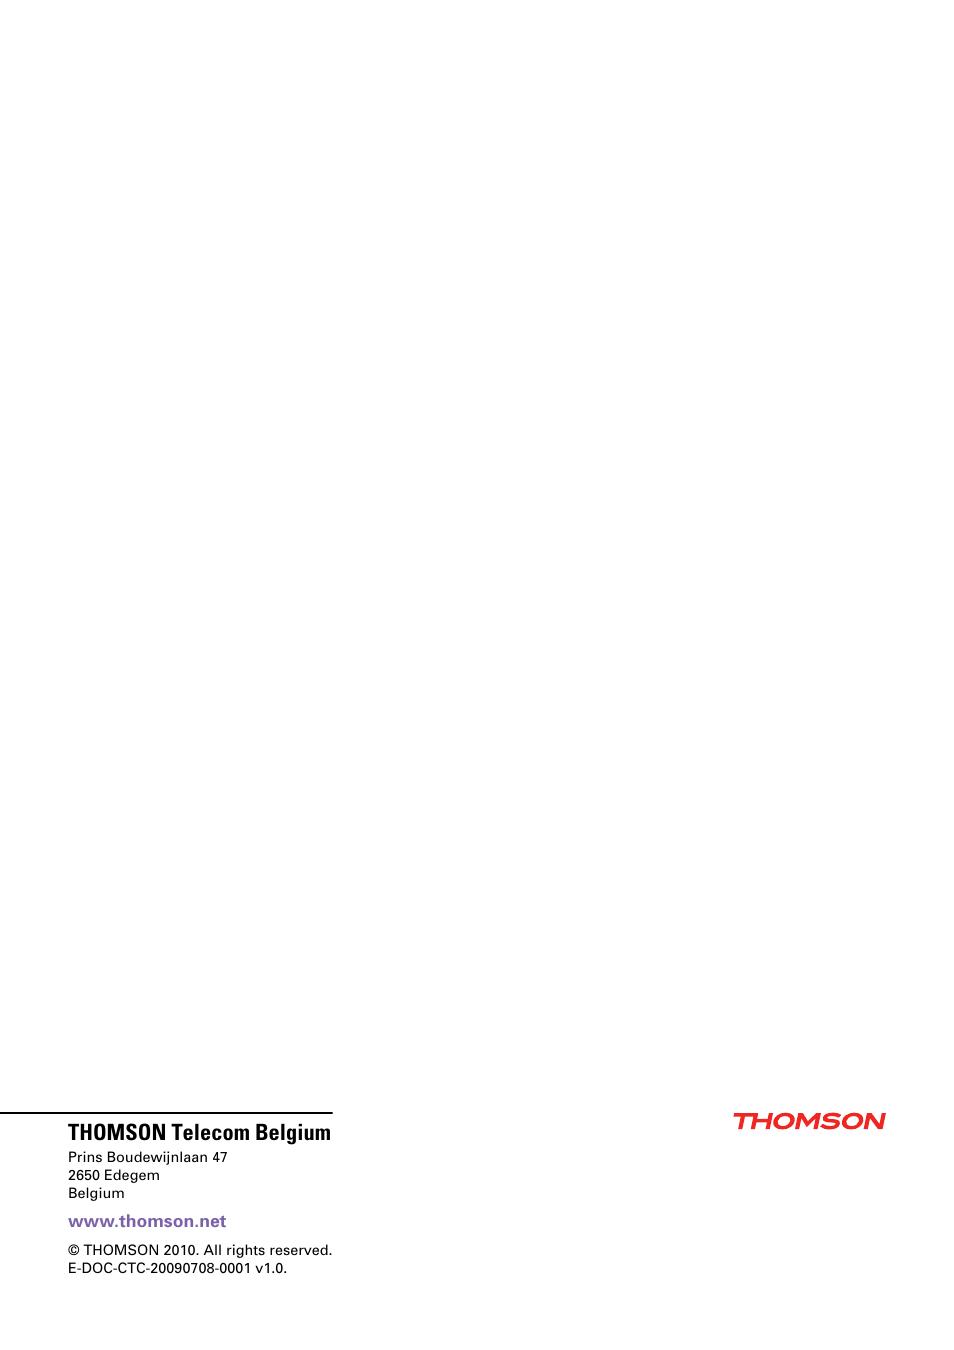 Thomson telecom belgium | Technicolor - Thomson TG585 V8 User Manual | Page  60 / 60